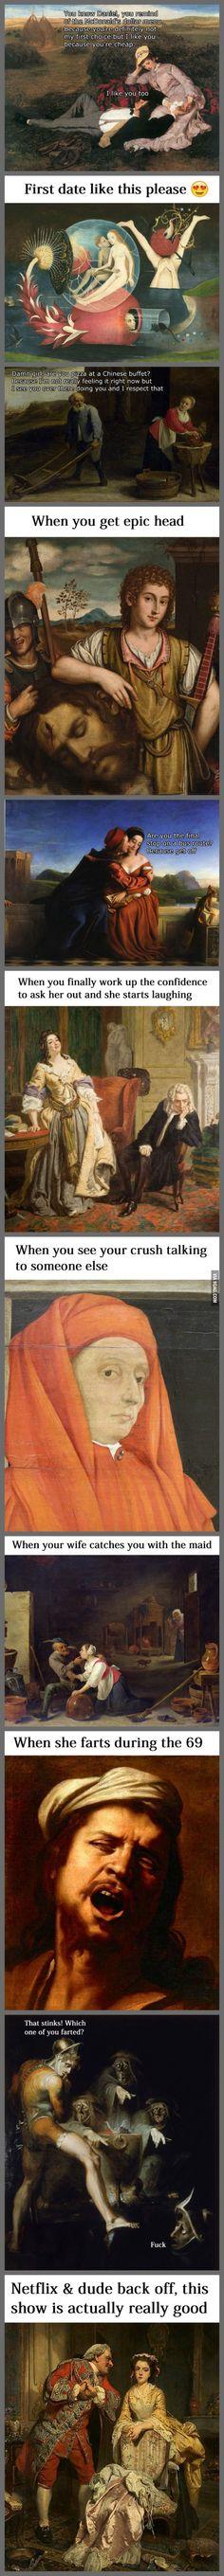 Classical Art Memes Latest (Part-22)